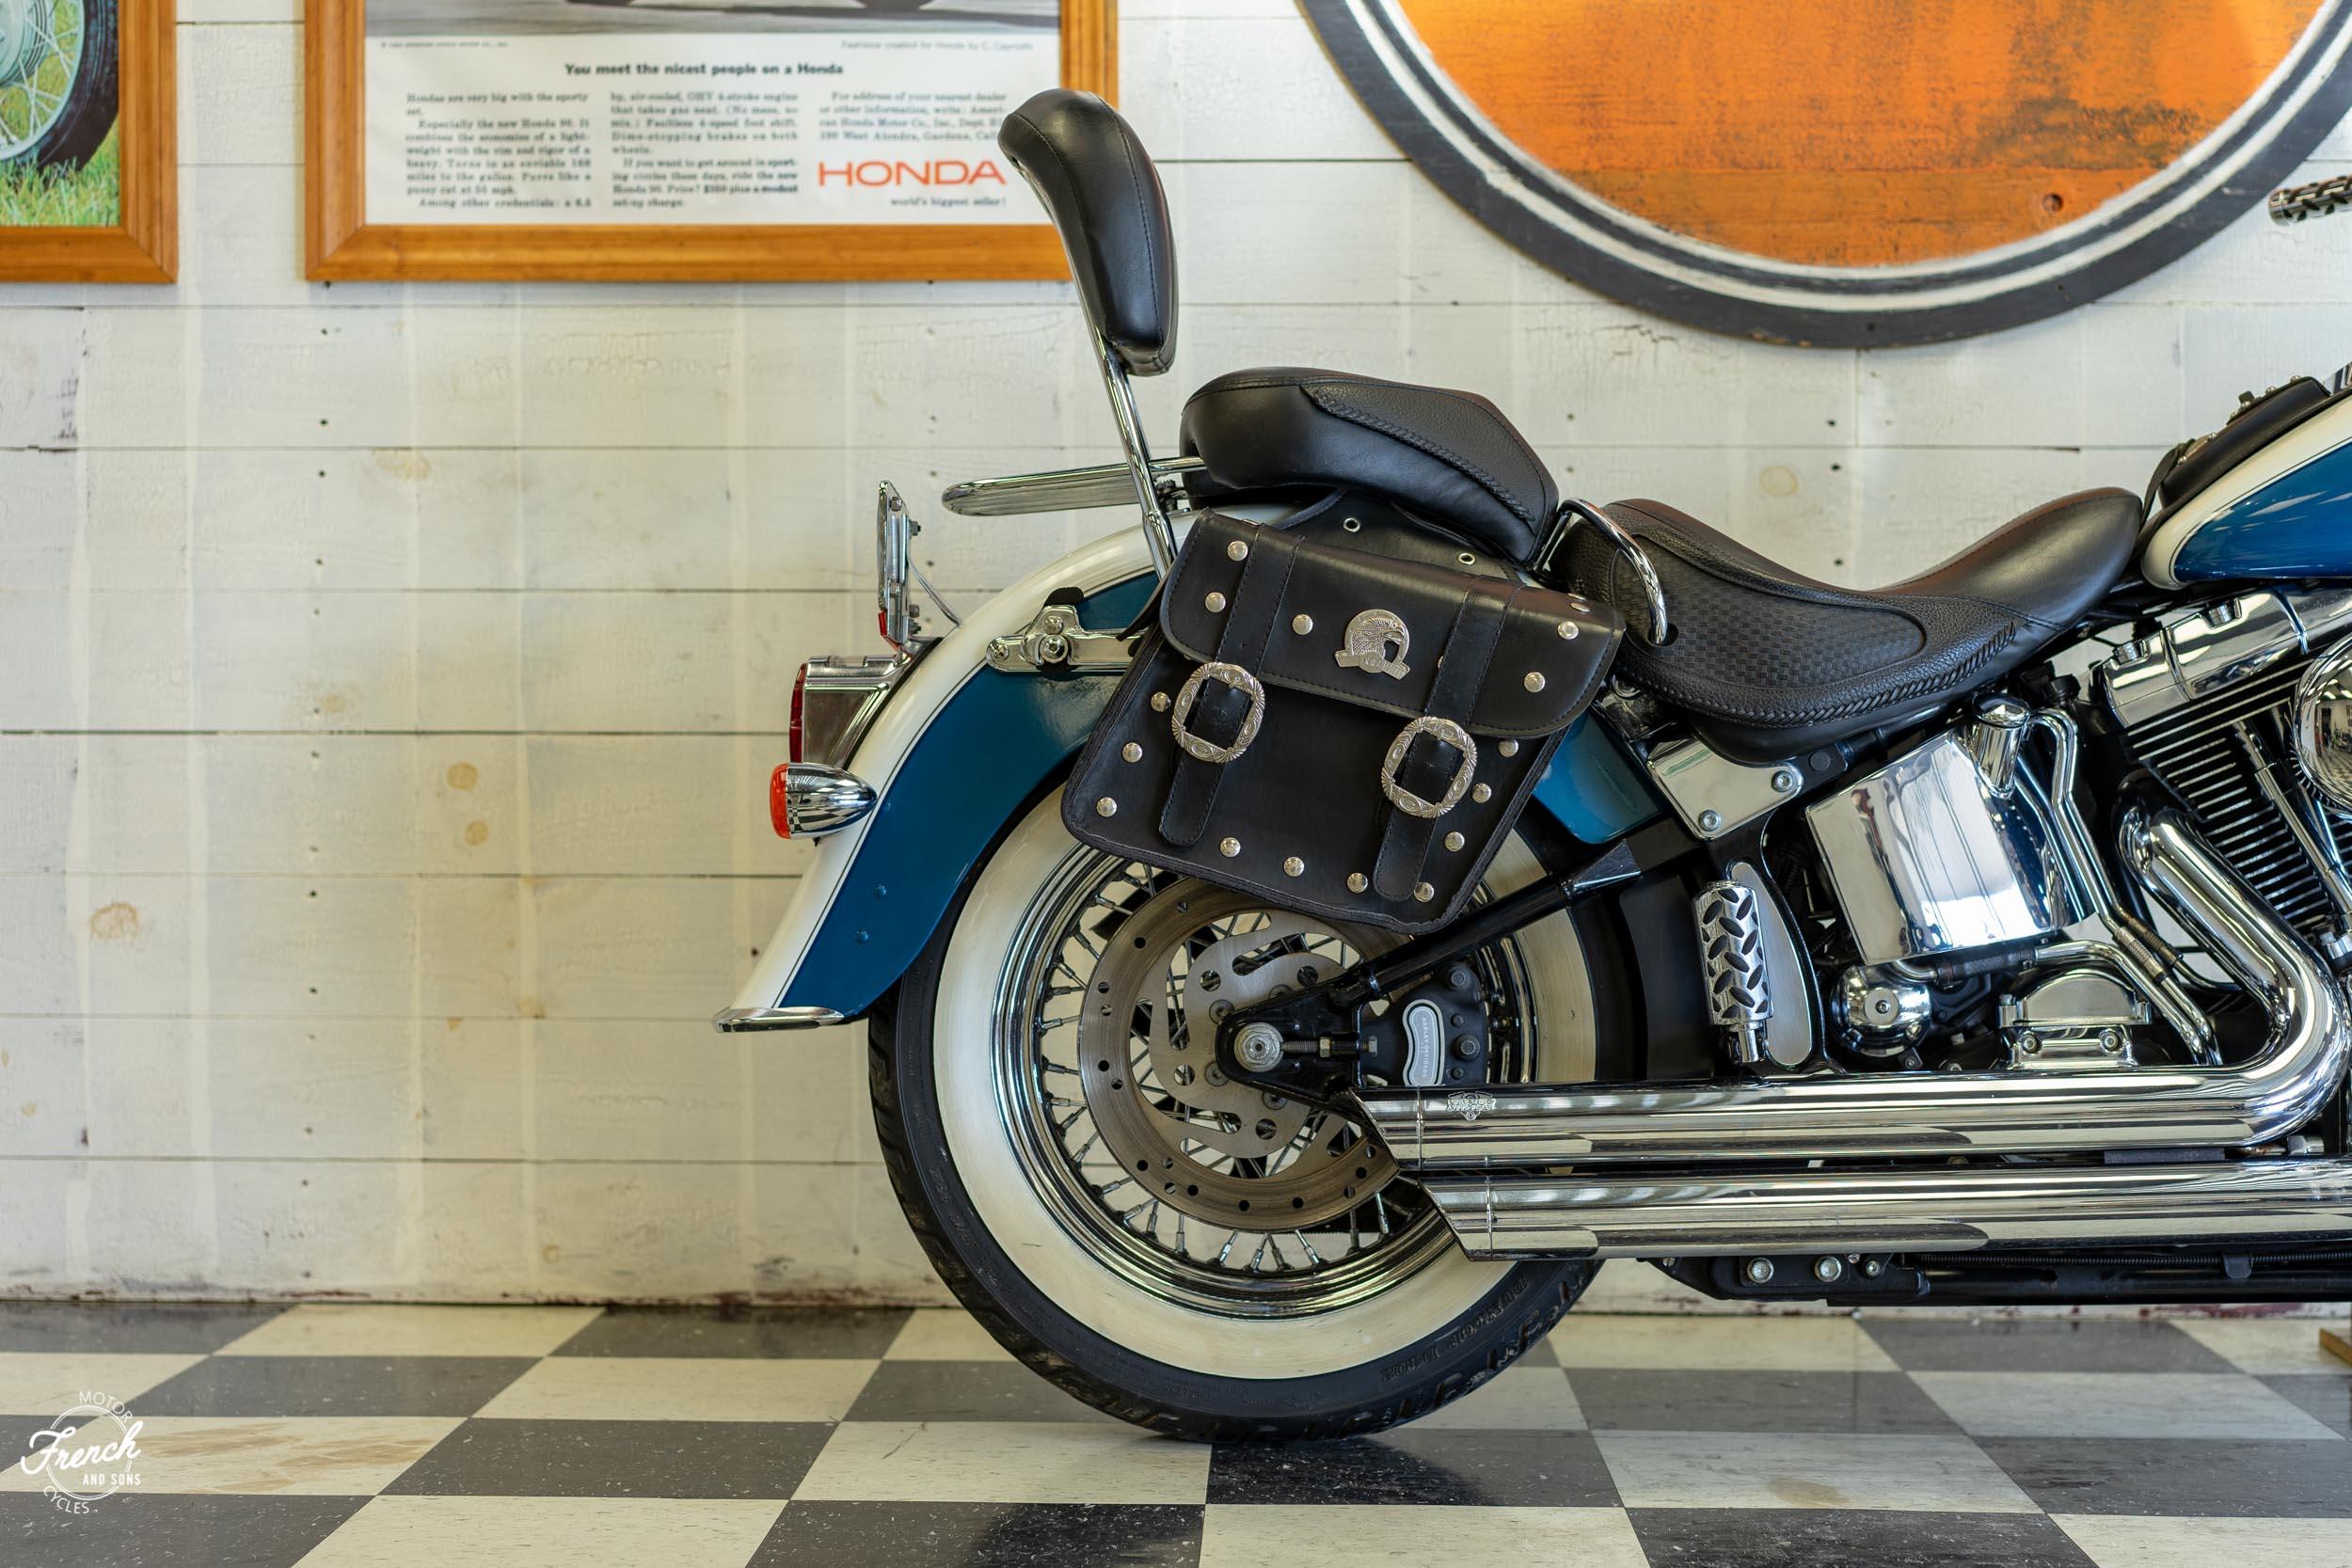 2005_Harley_Davidson_Softail_Deluxe-3.jpg